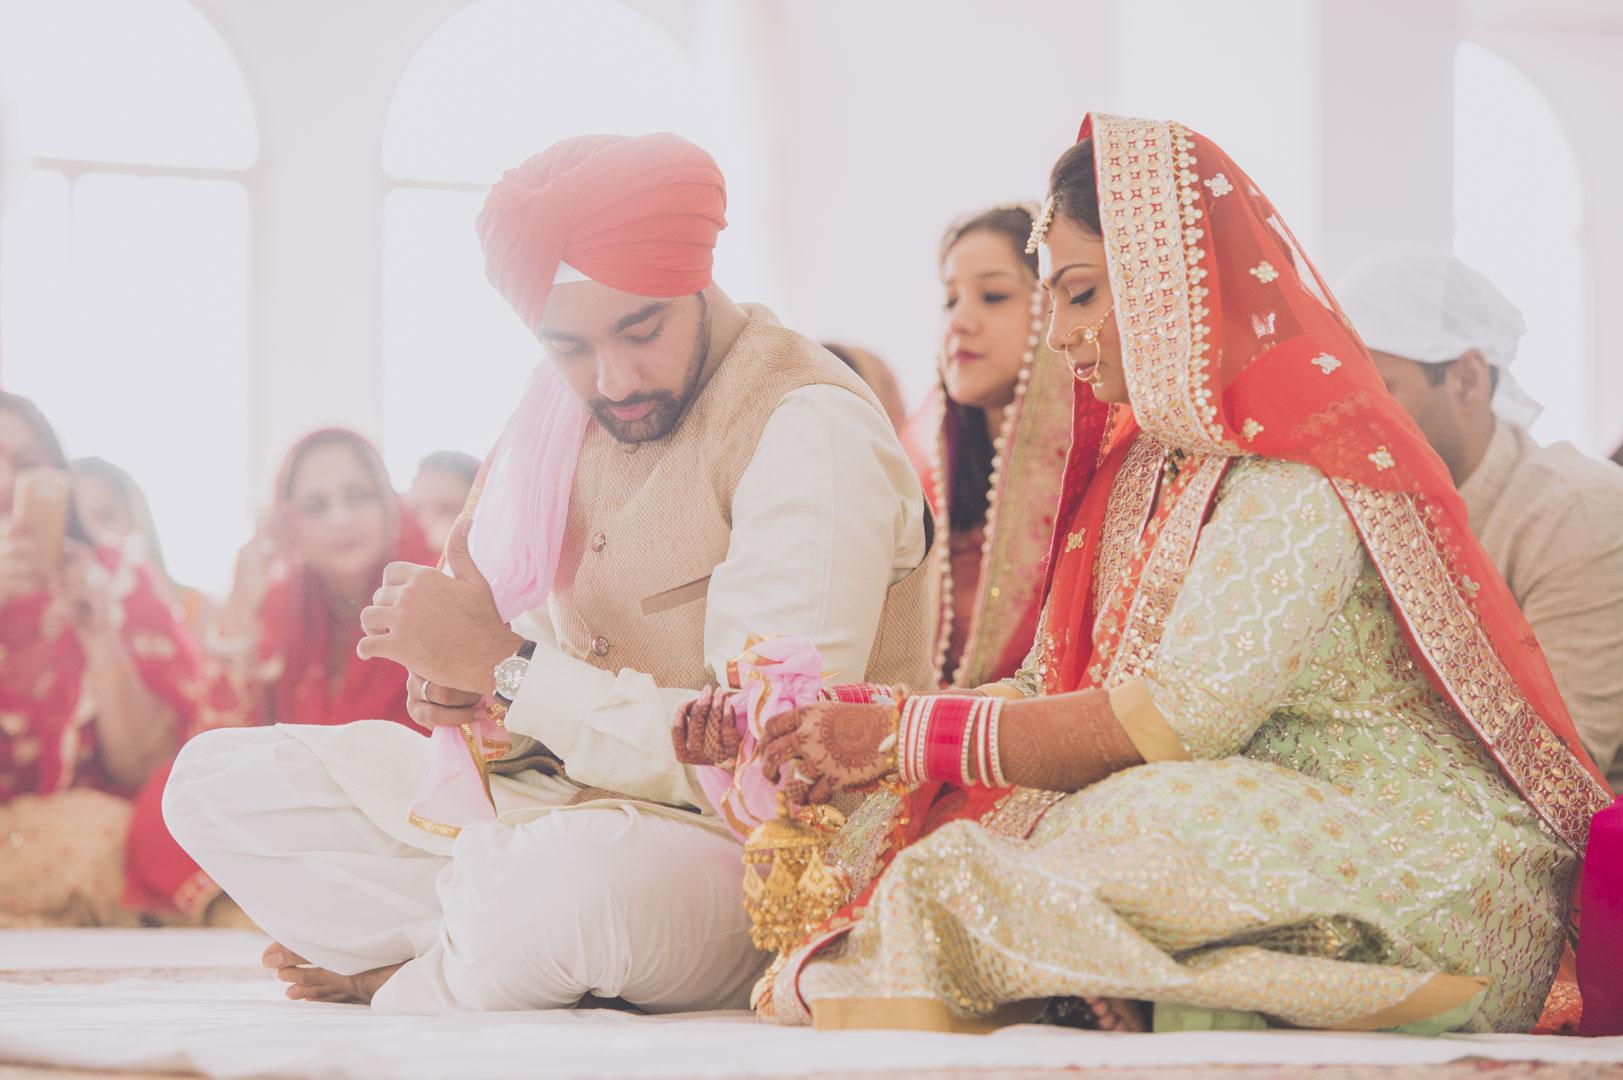 Radhika & Nirbhay (P C: Pulkesin Tiwary)